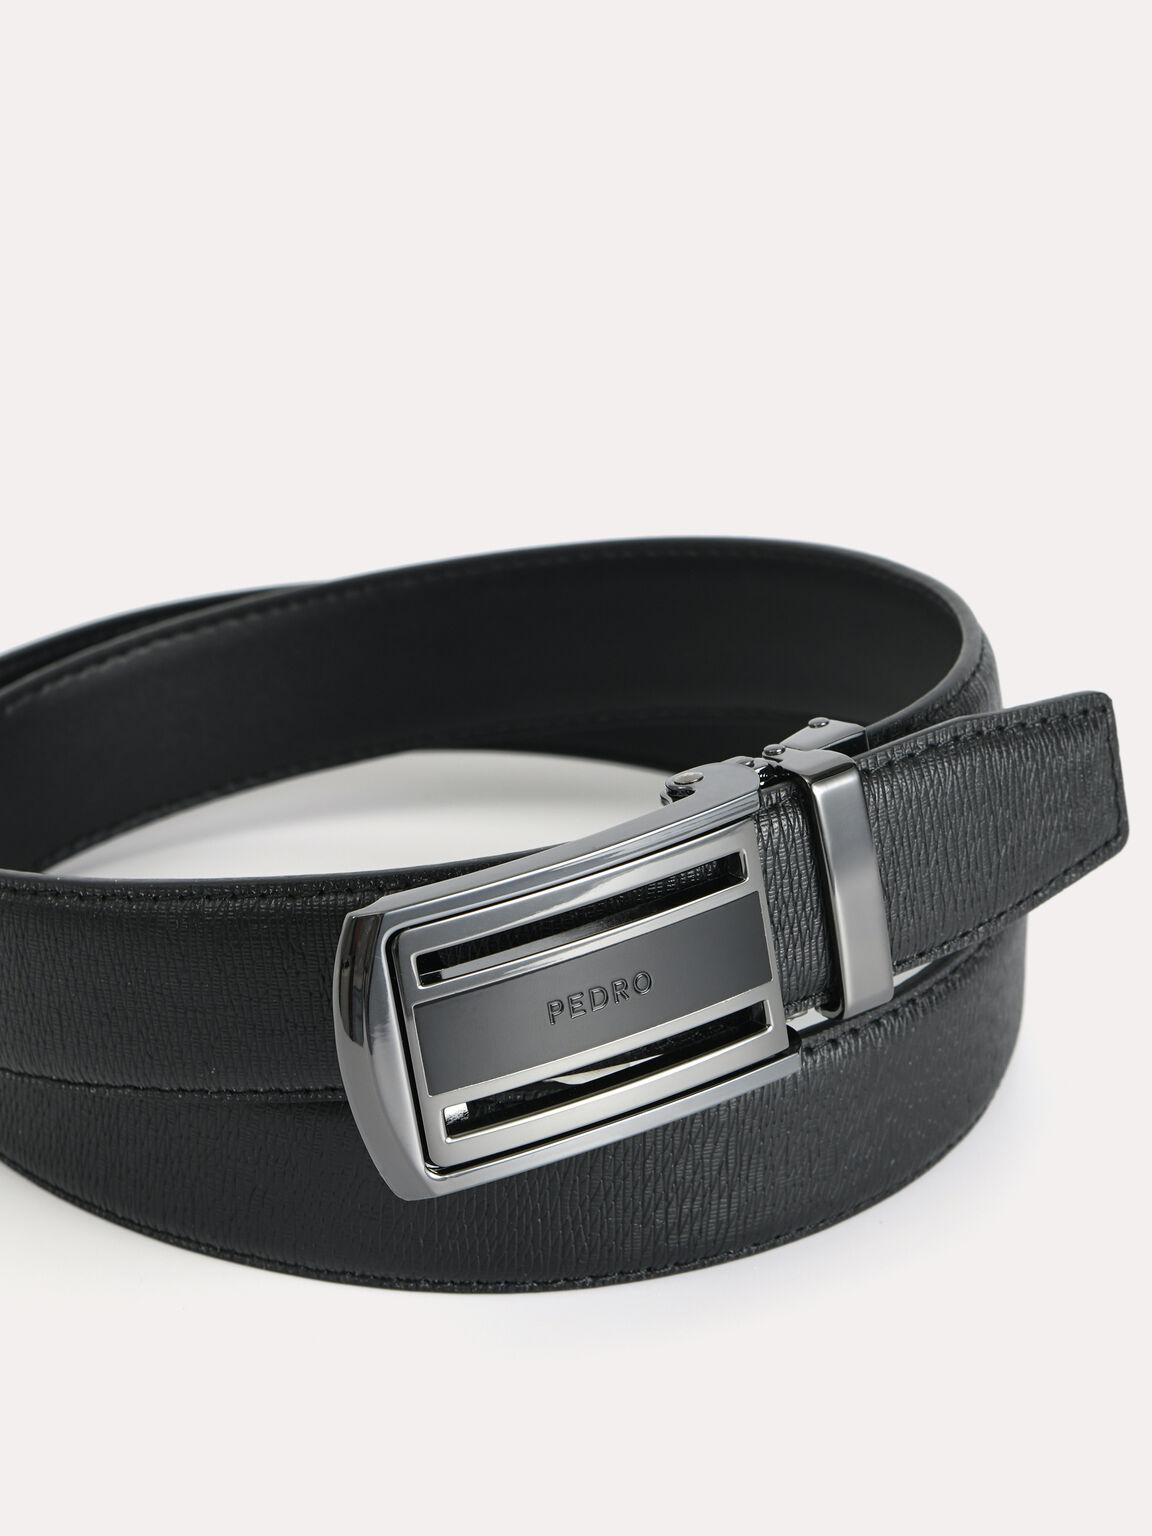 Textured Leather Automatic Belt, Black, hi-res